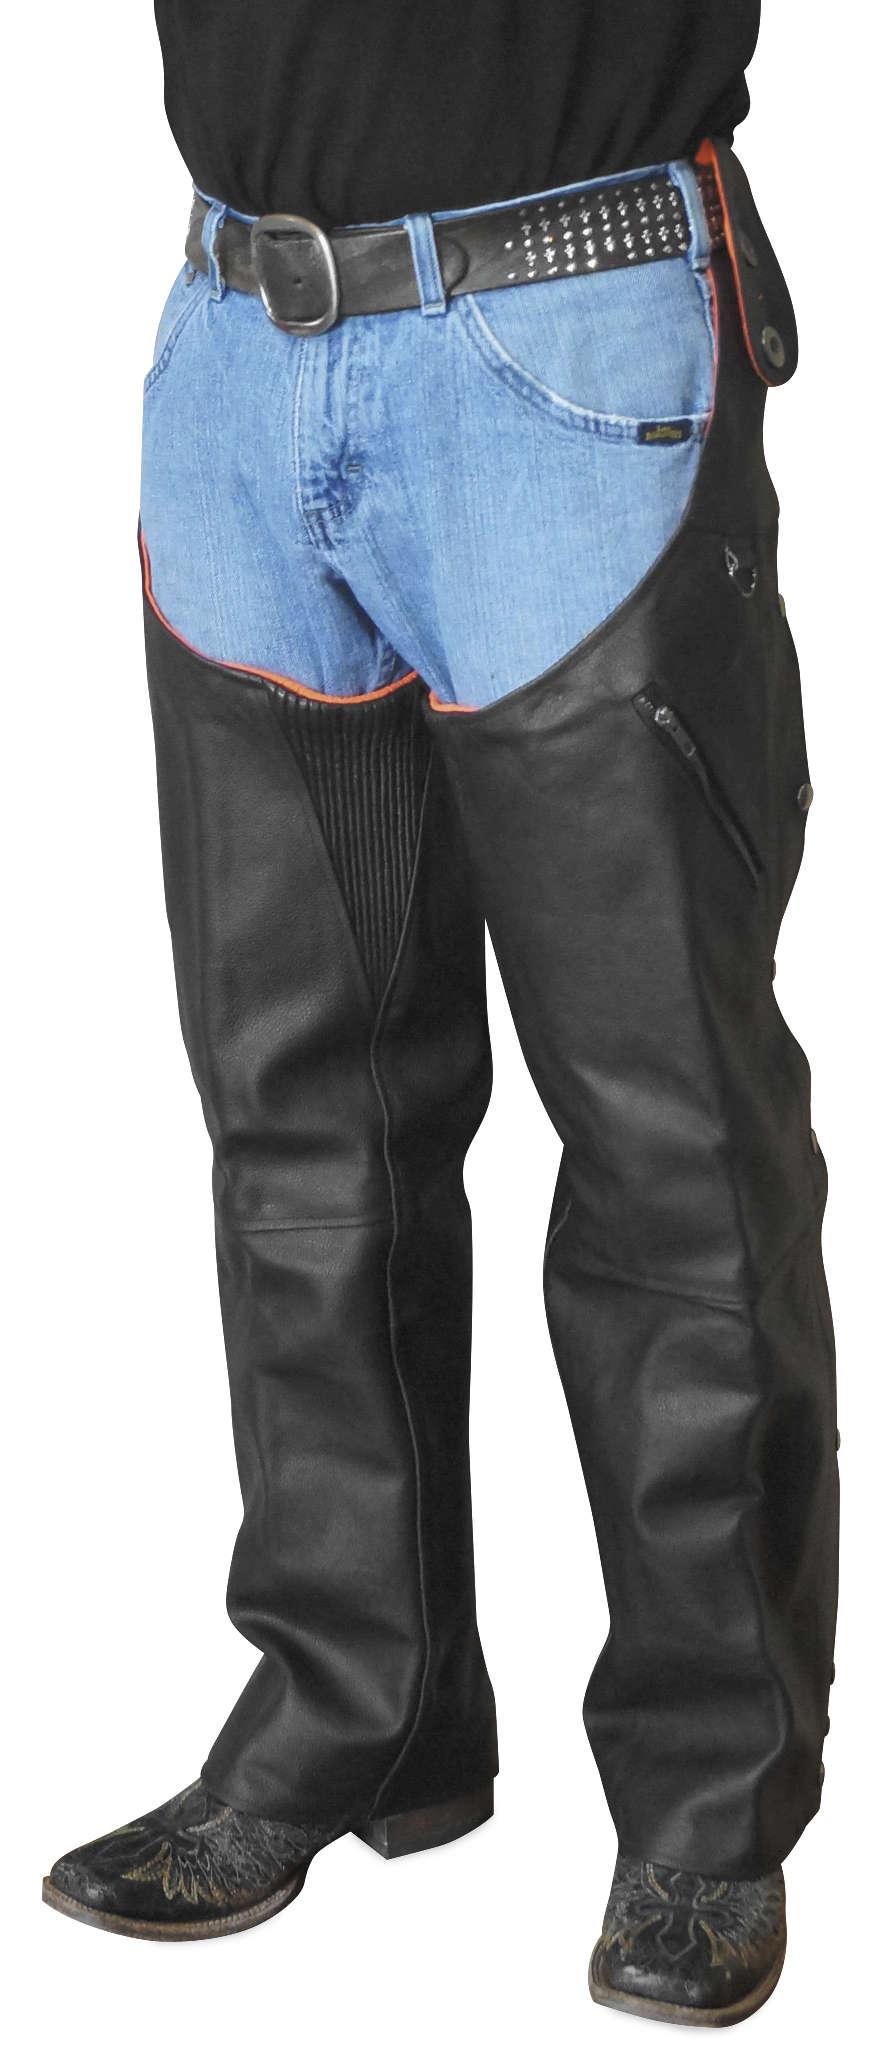 Reversible Leather and Hi-Vis Orange Hook Chaps